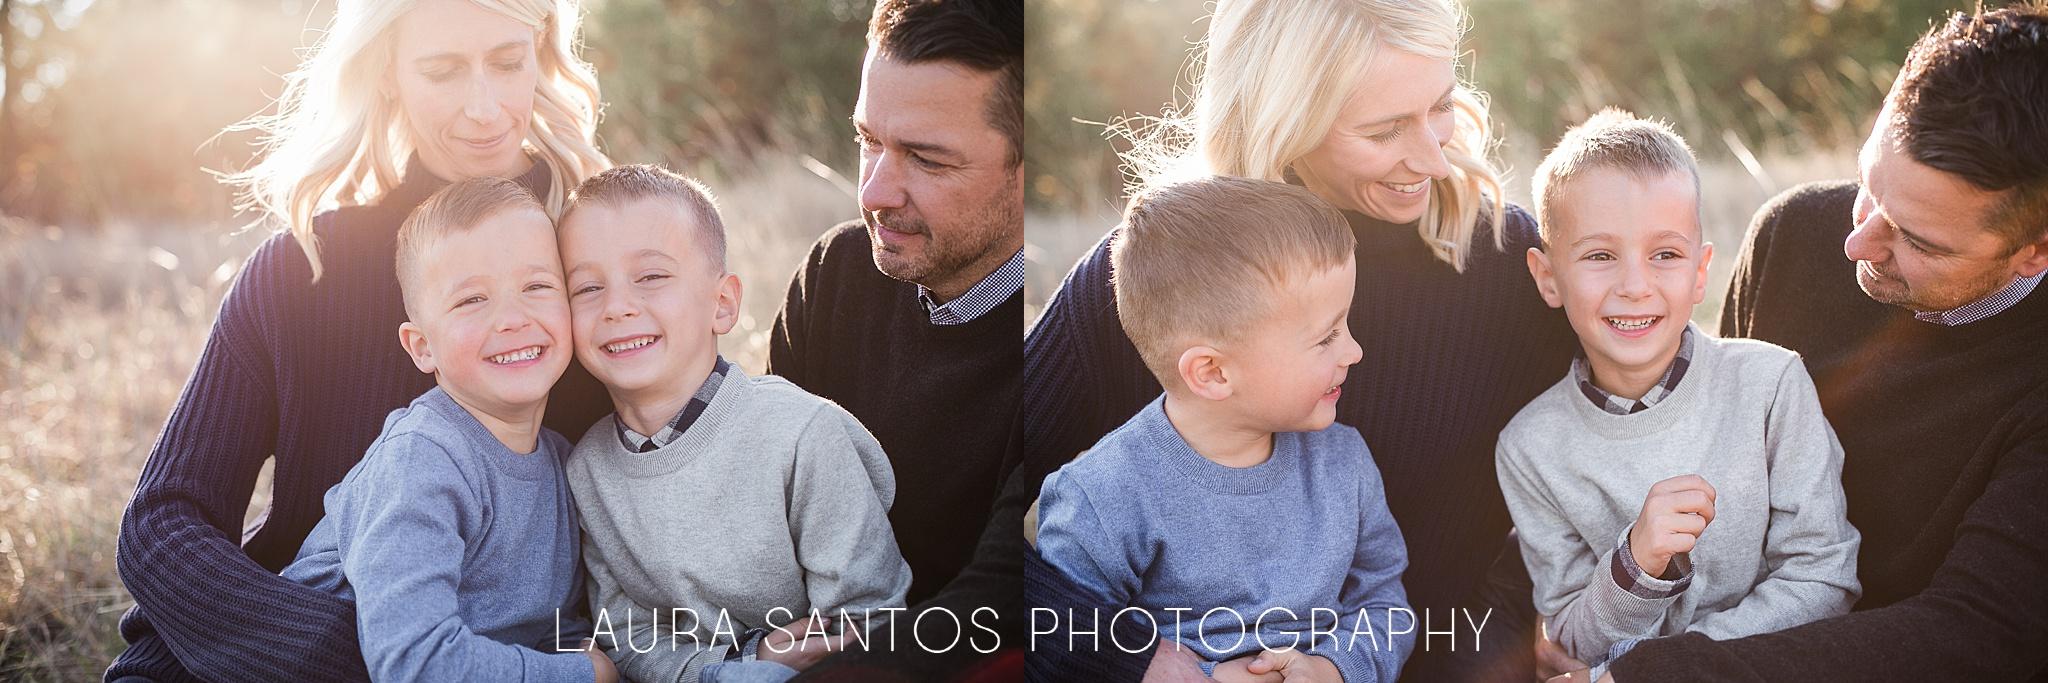 Laura Santos Photography Portland Oregon Family Photographer_0816.jpg